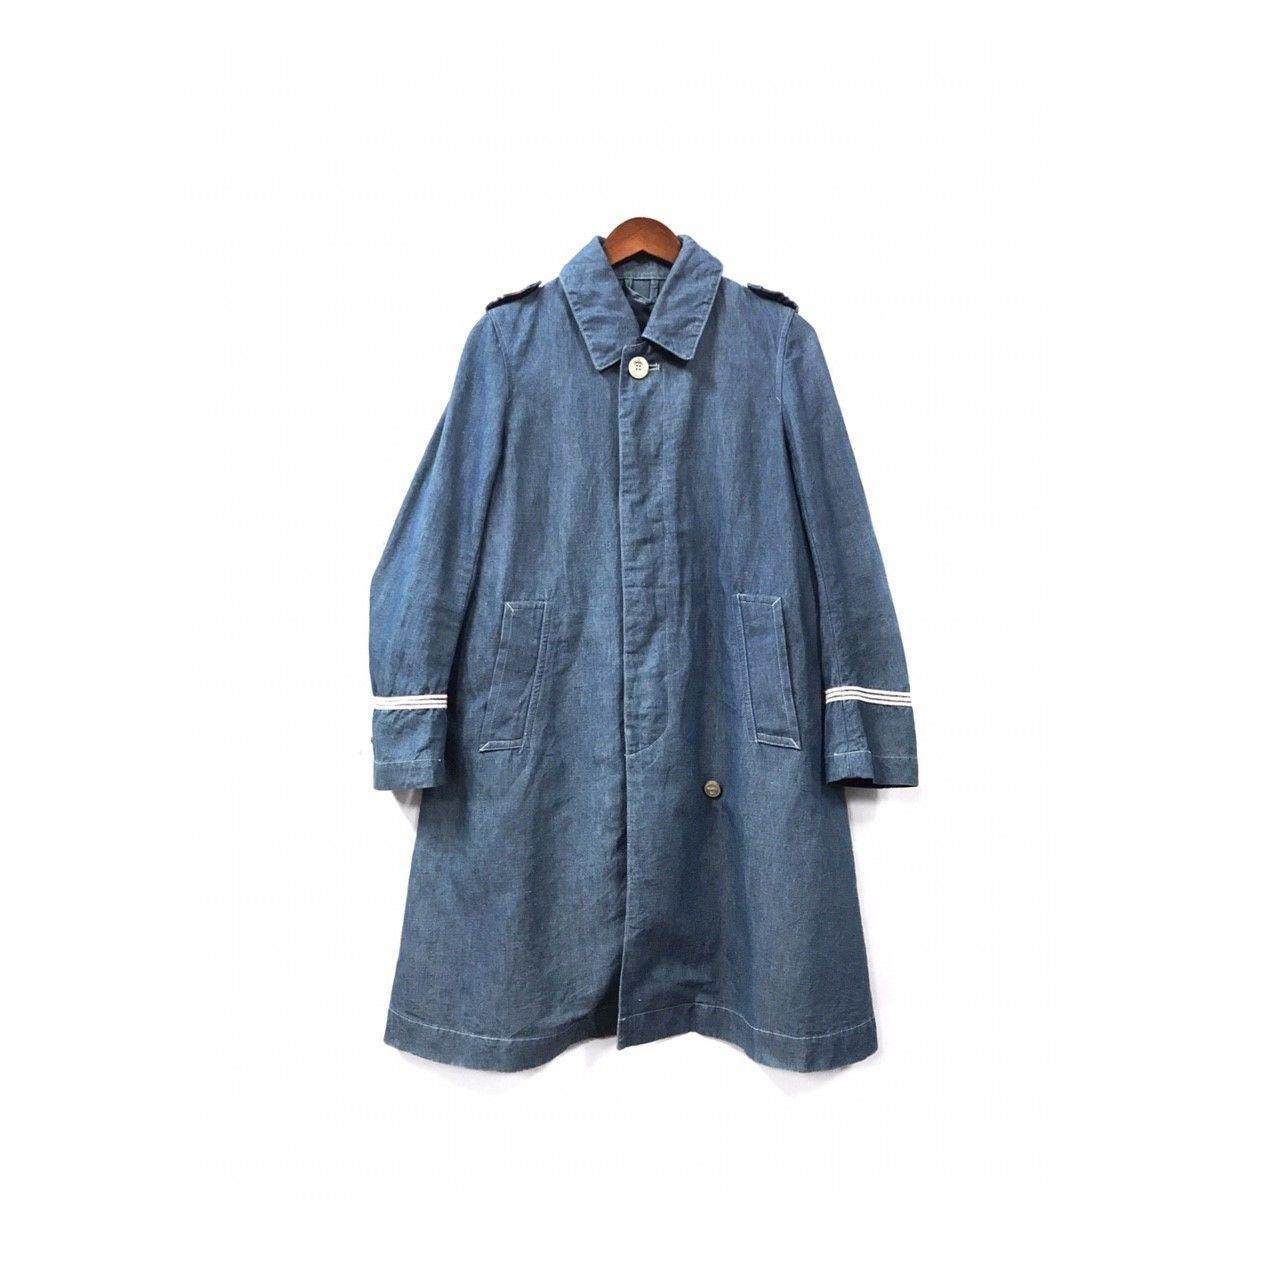 Robes&Confections - Design Soutiencollar Coat (size - 1) ?12500+tax